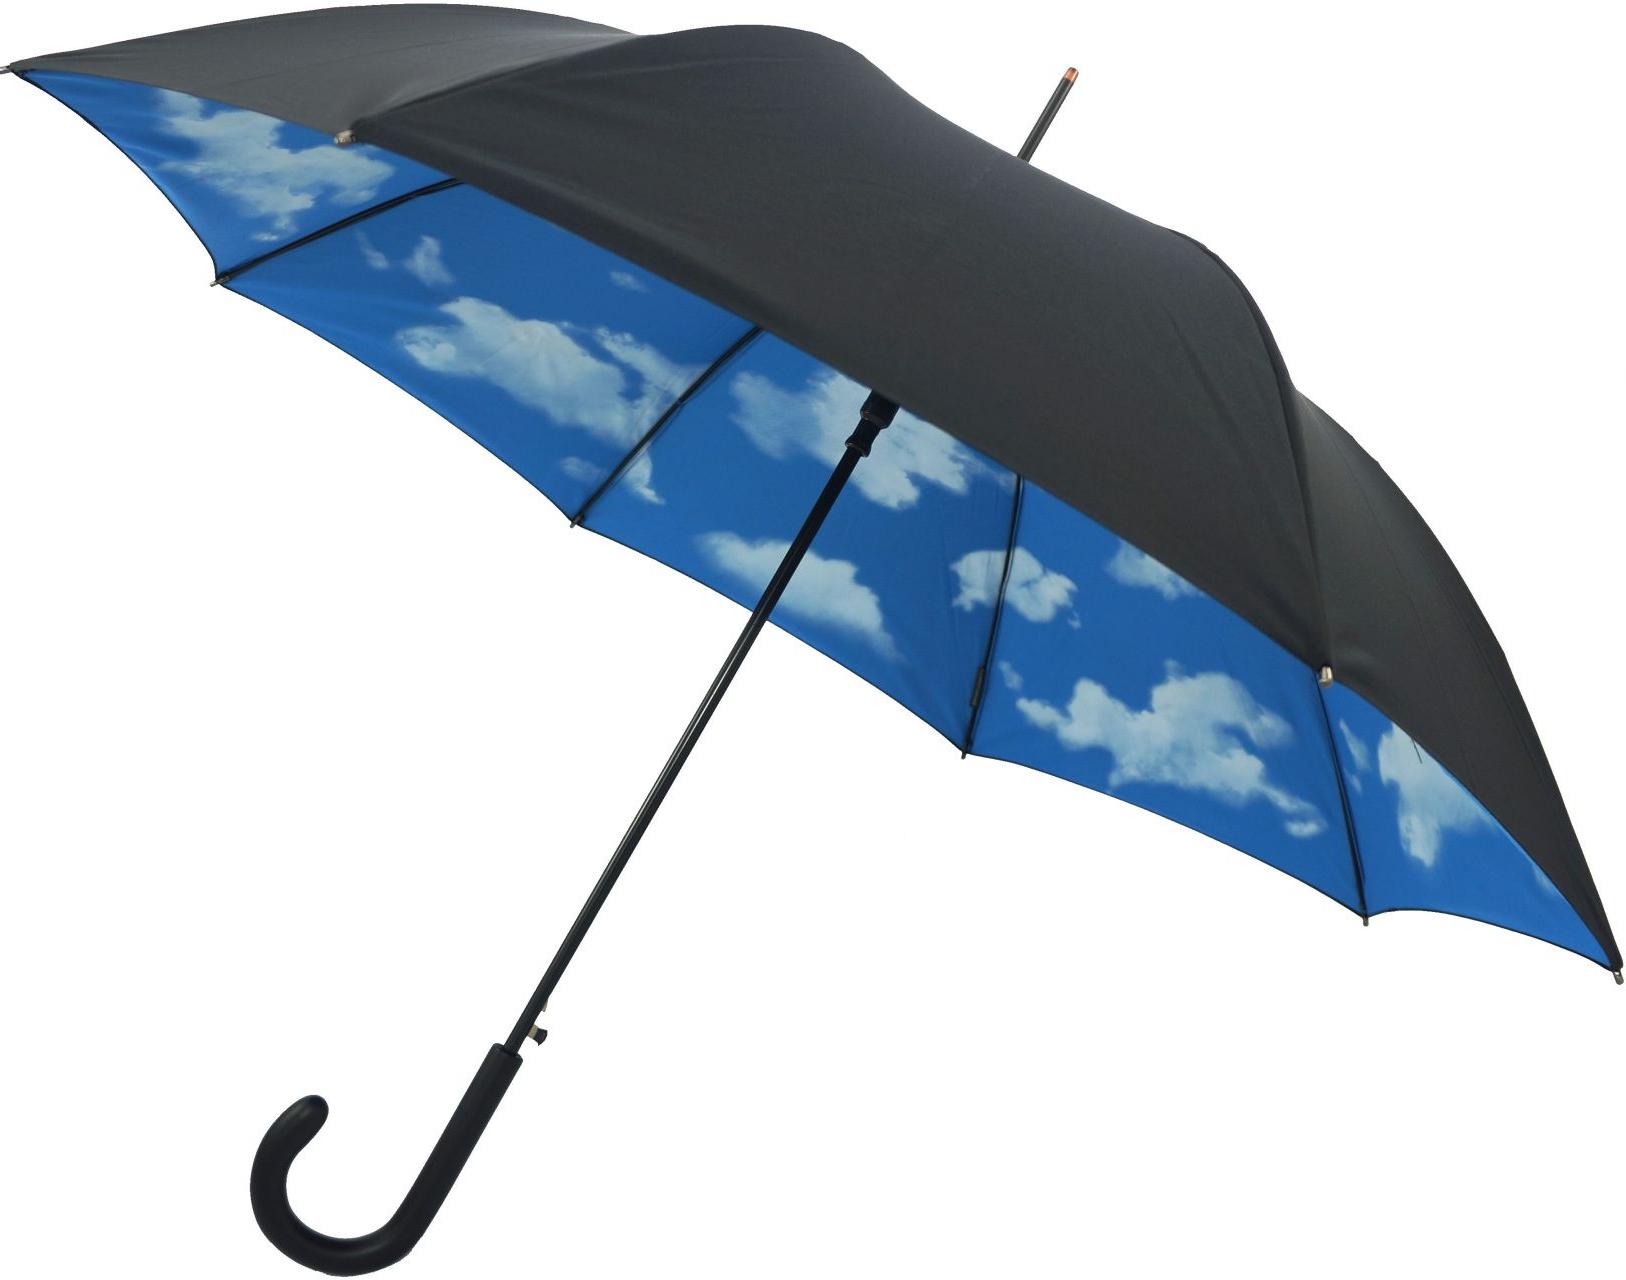 Zeman Market Umbrellas Within Favorite Double Canopy Umbrella Blue Sky & Cloud Design Inside Black Outside (View 19 of 20)